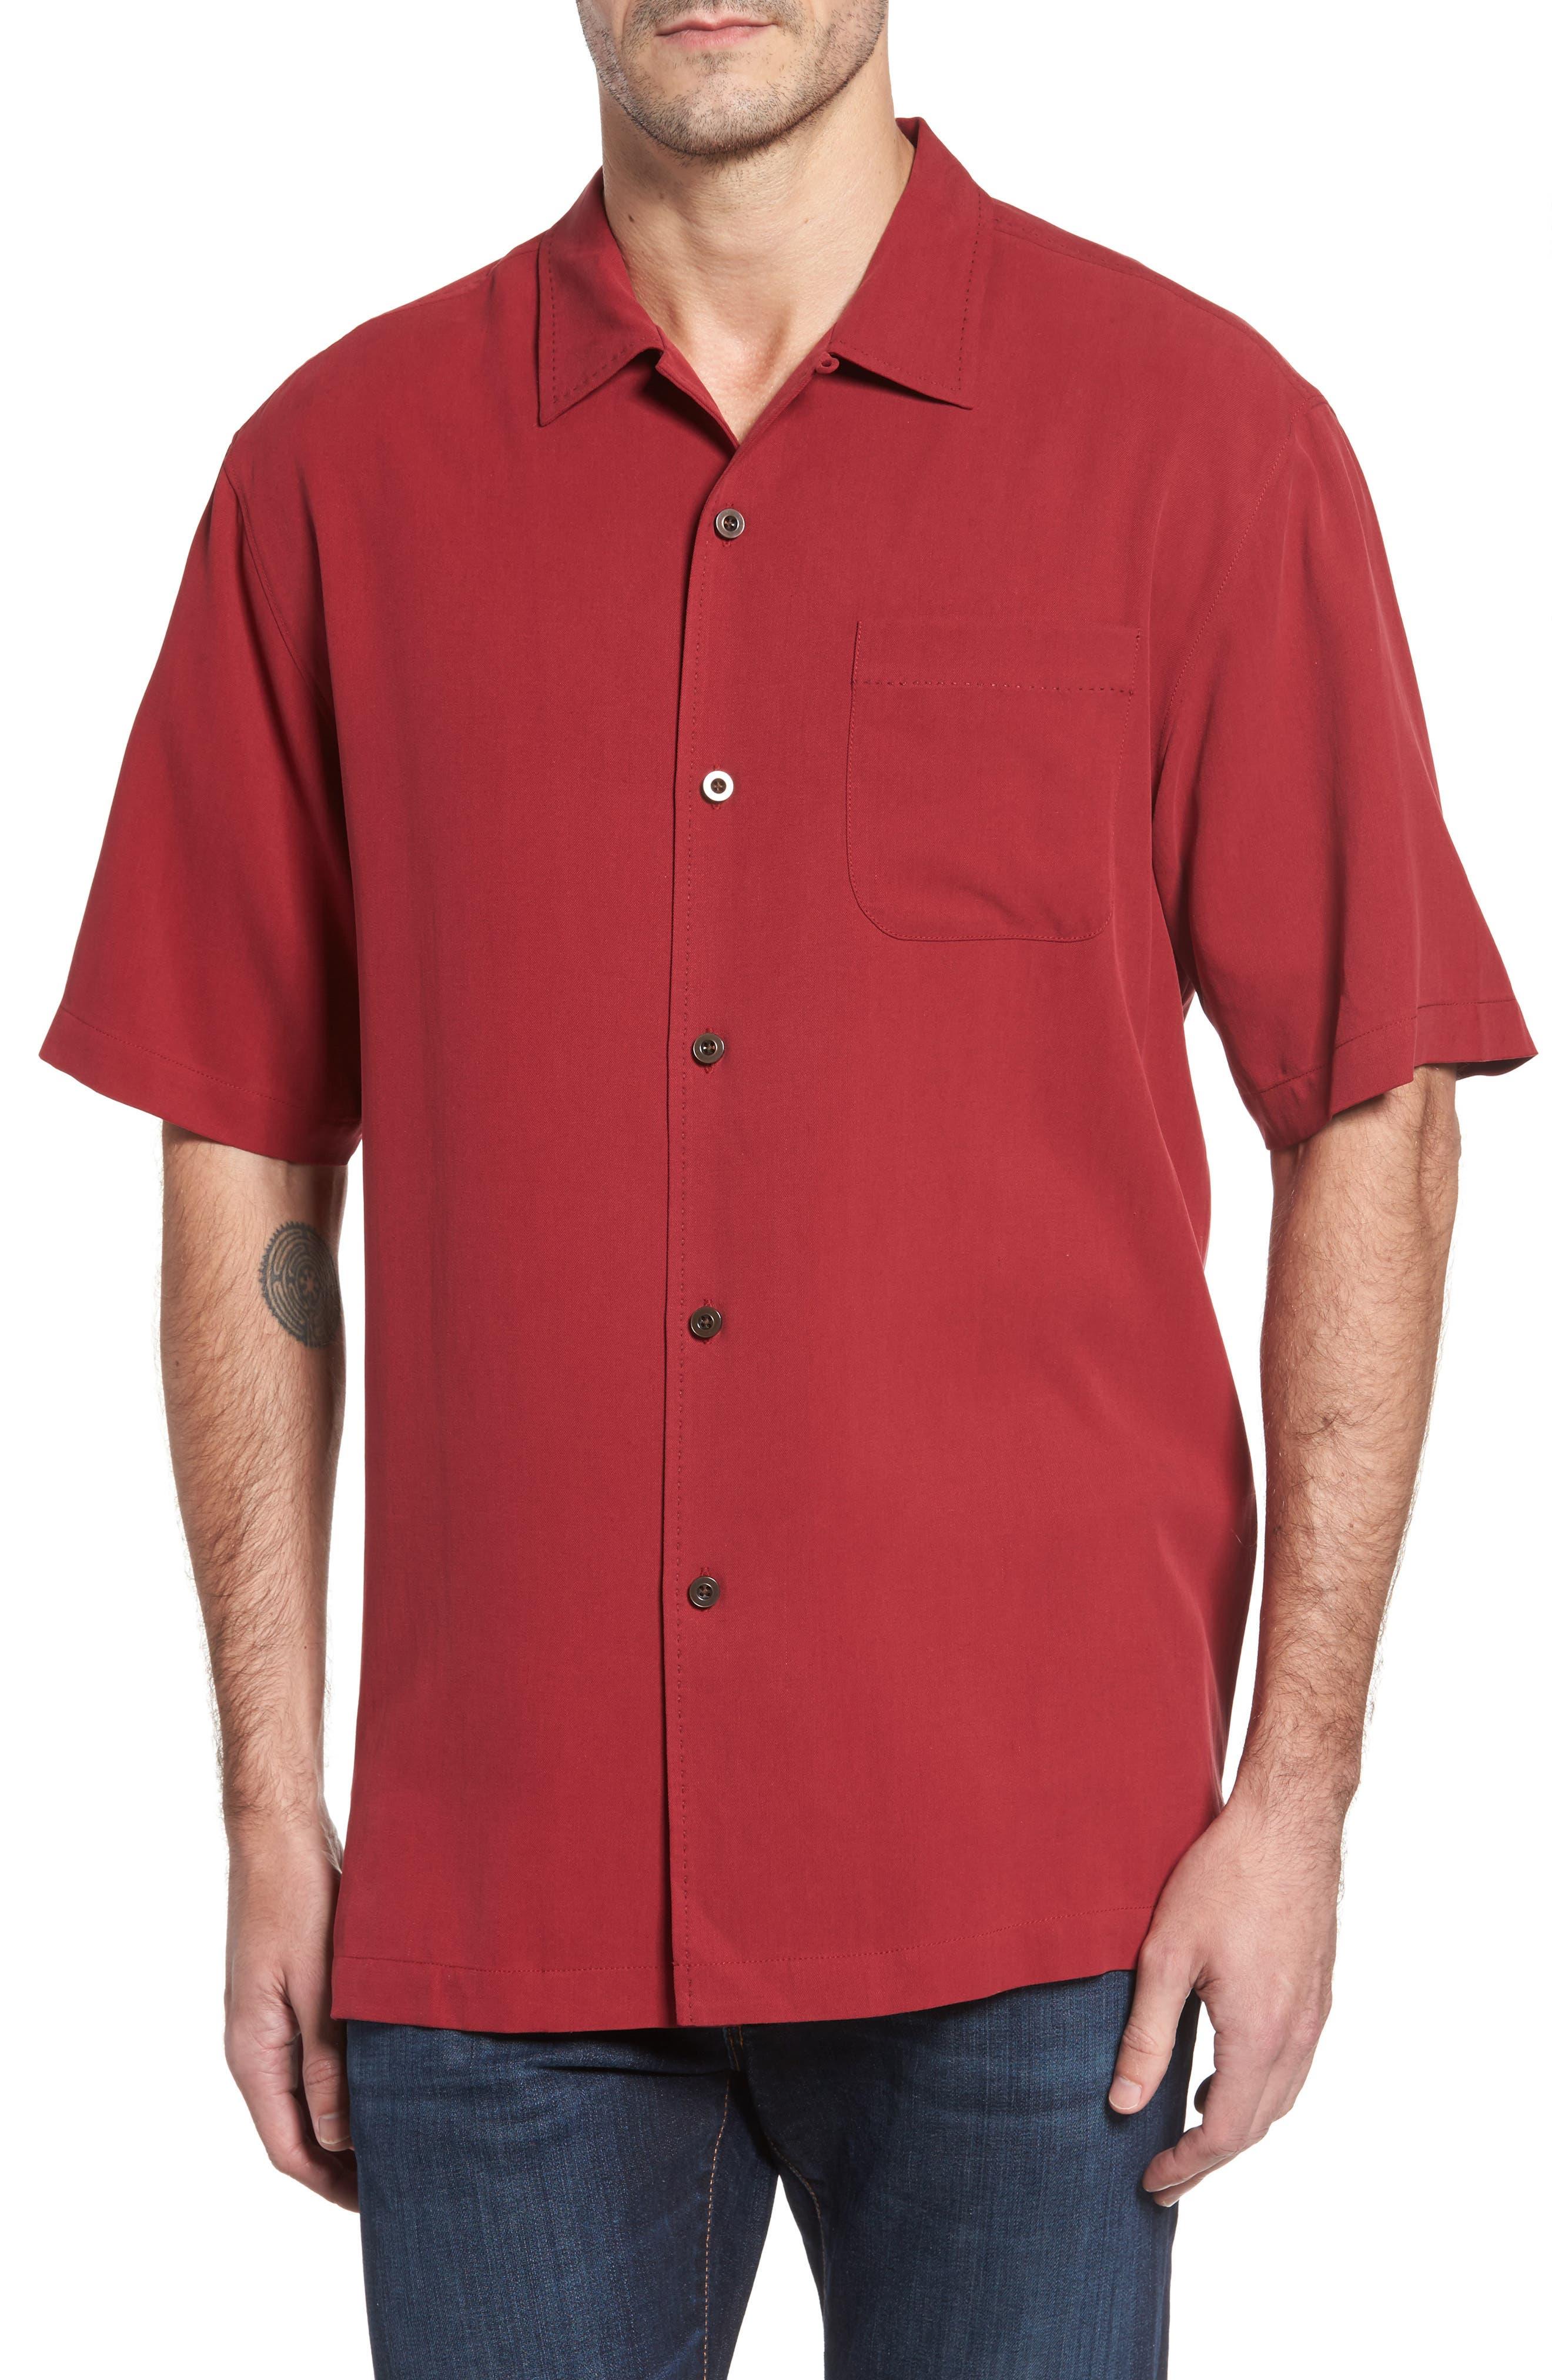 Main Image - Tommy Bahama Catalina Twill Short Sleeve Silk Camp Shirt